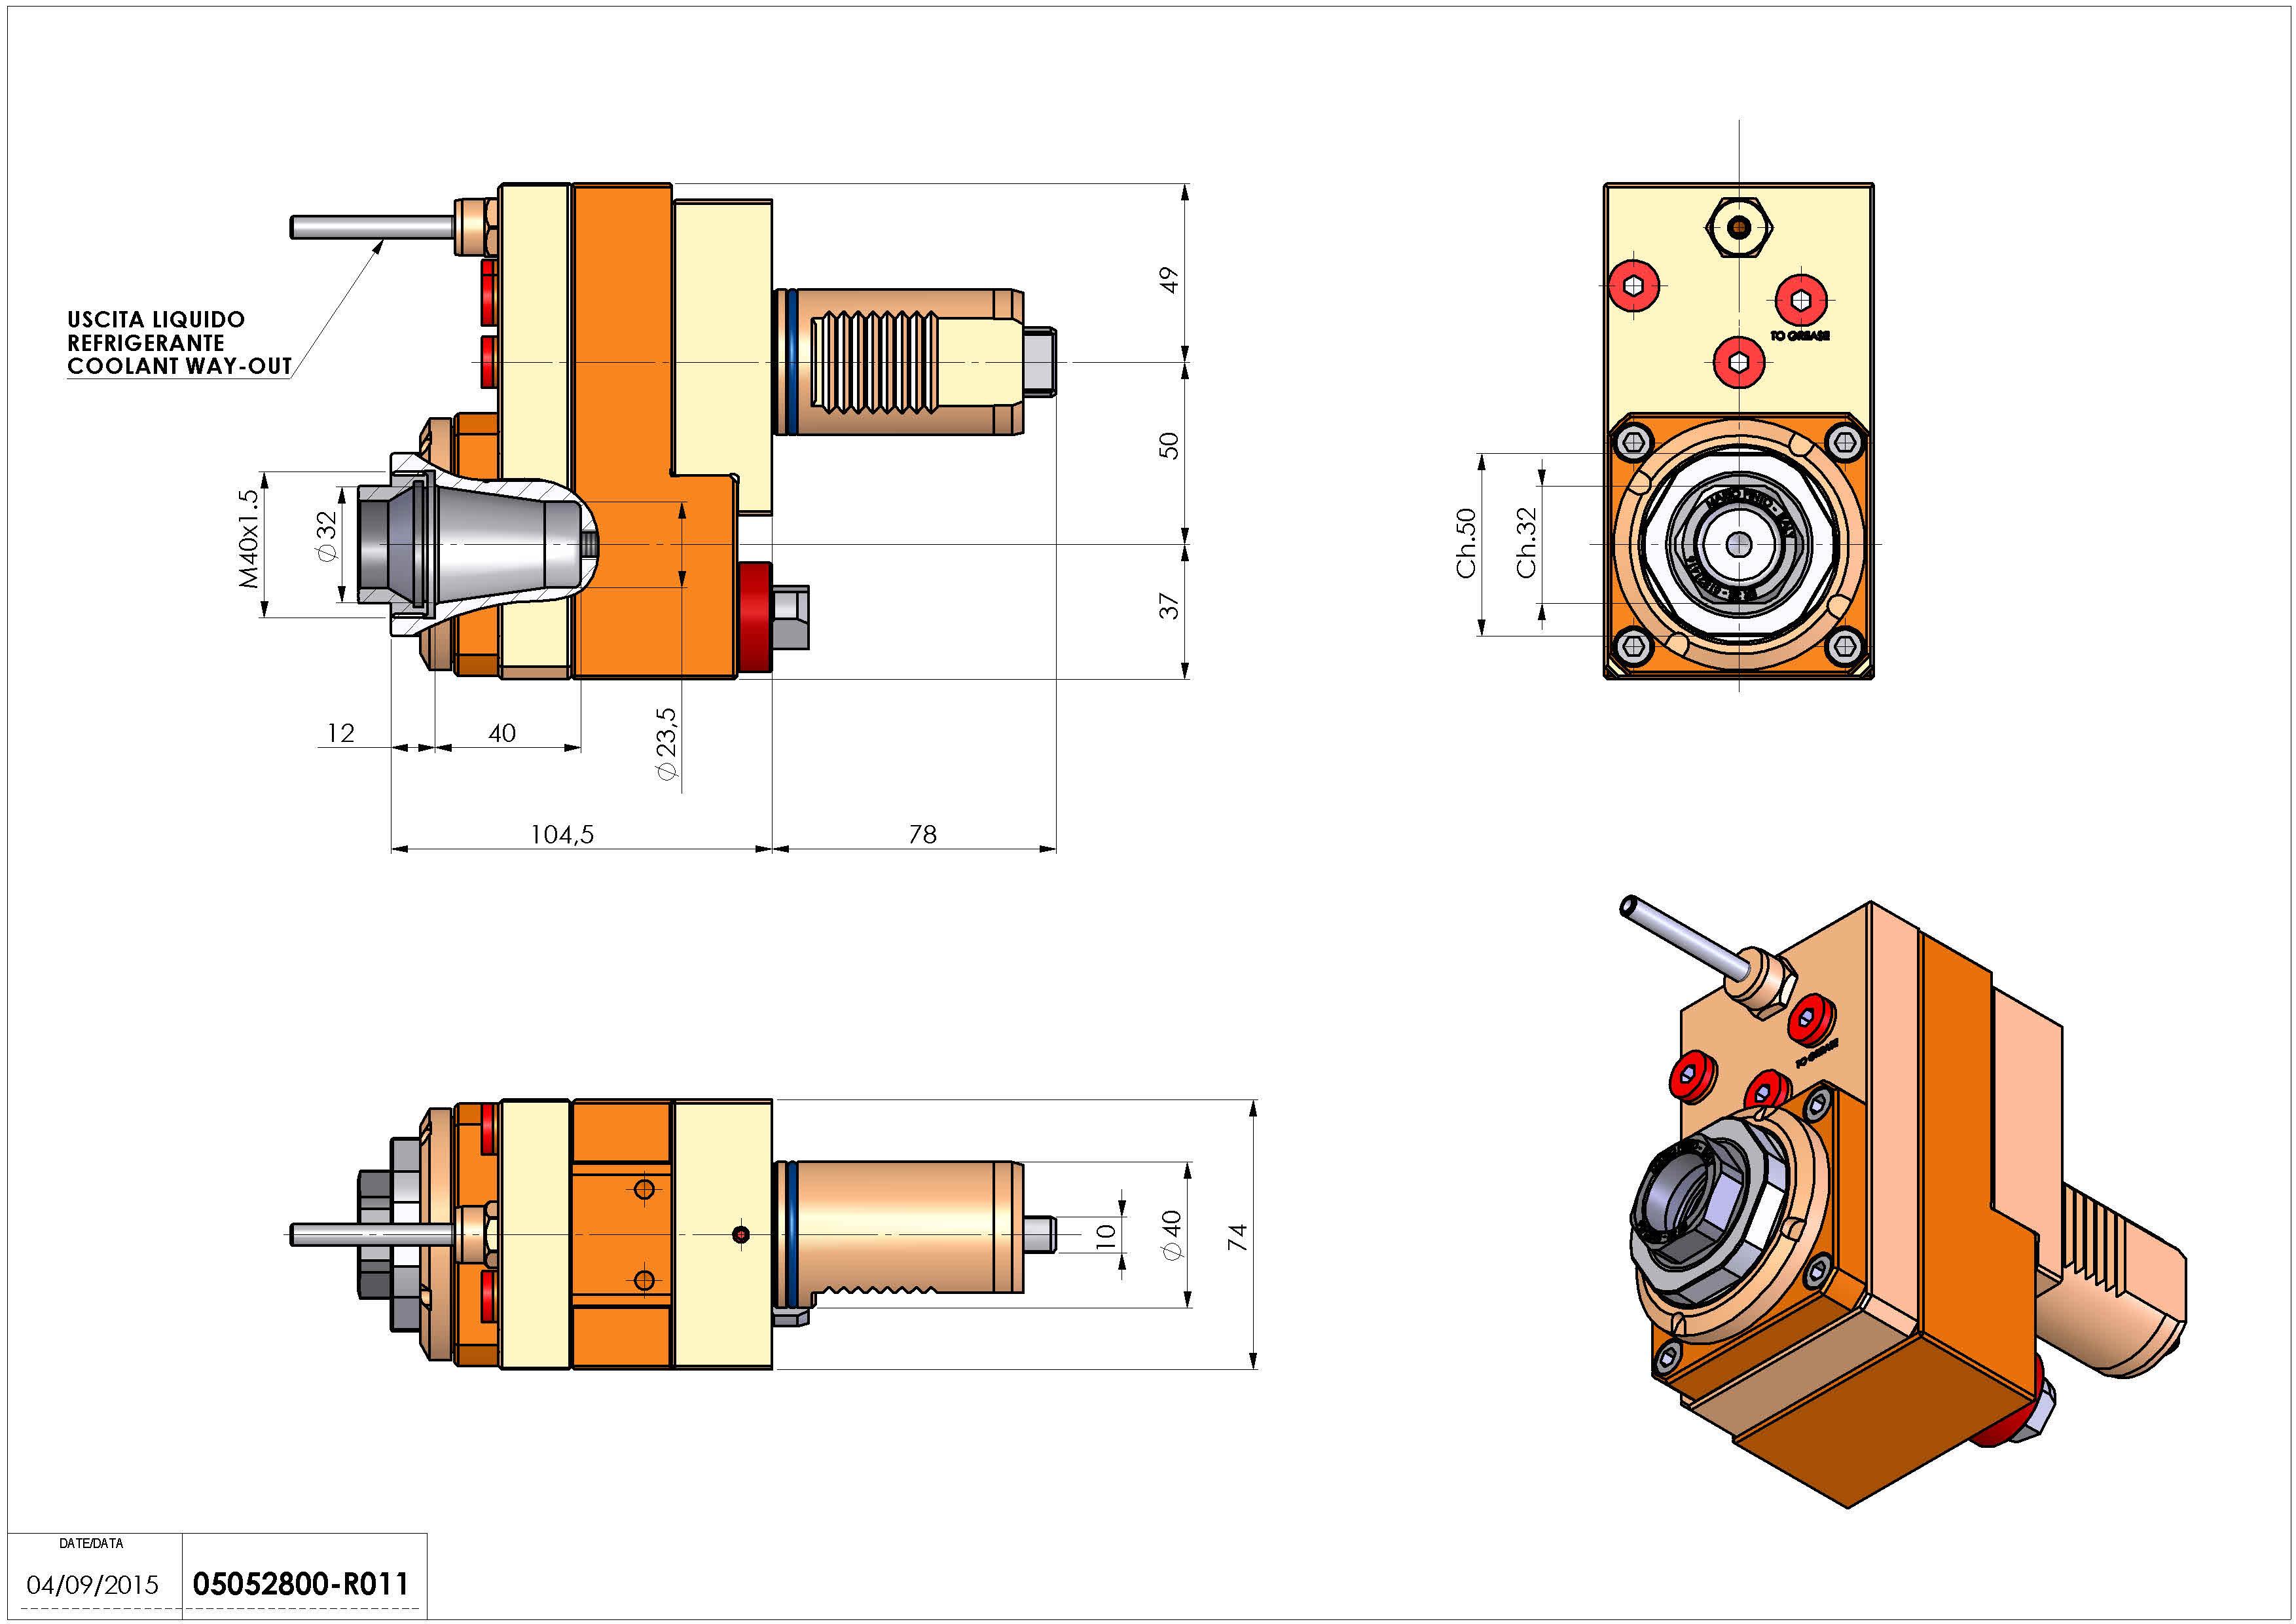 Technical image - LT-S VDI40ER32FOFS50H105 MLTMZ H117 MAZAK MULTIPLEX 6200 625.